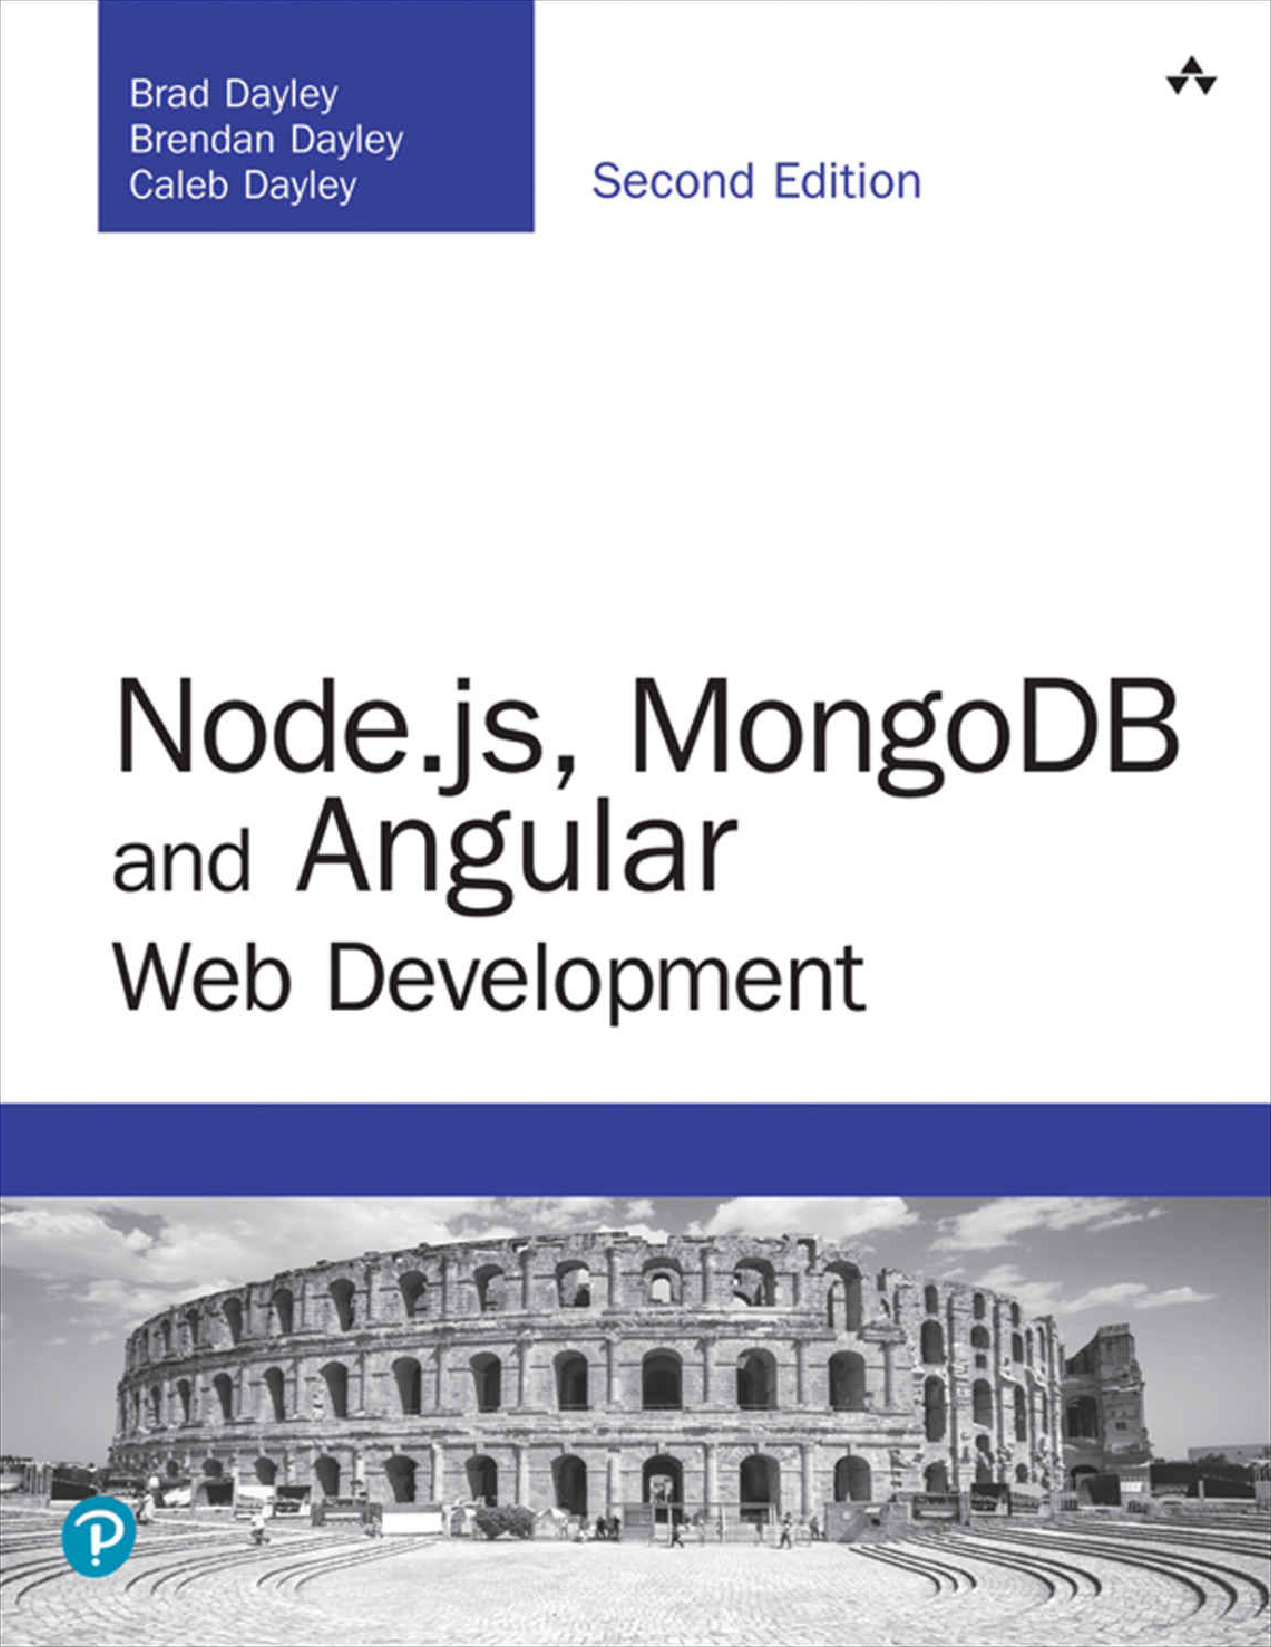 Node js, MongoDB And Angular Web Development: The Definitive